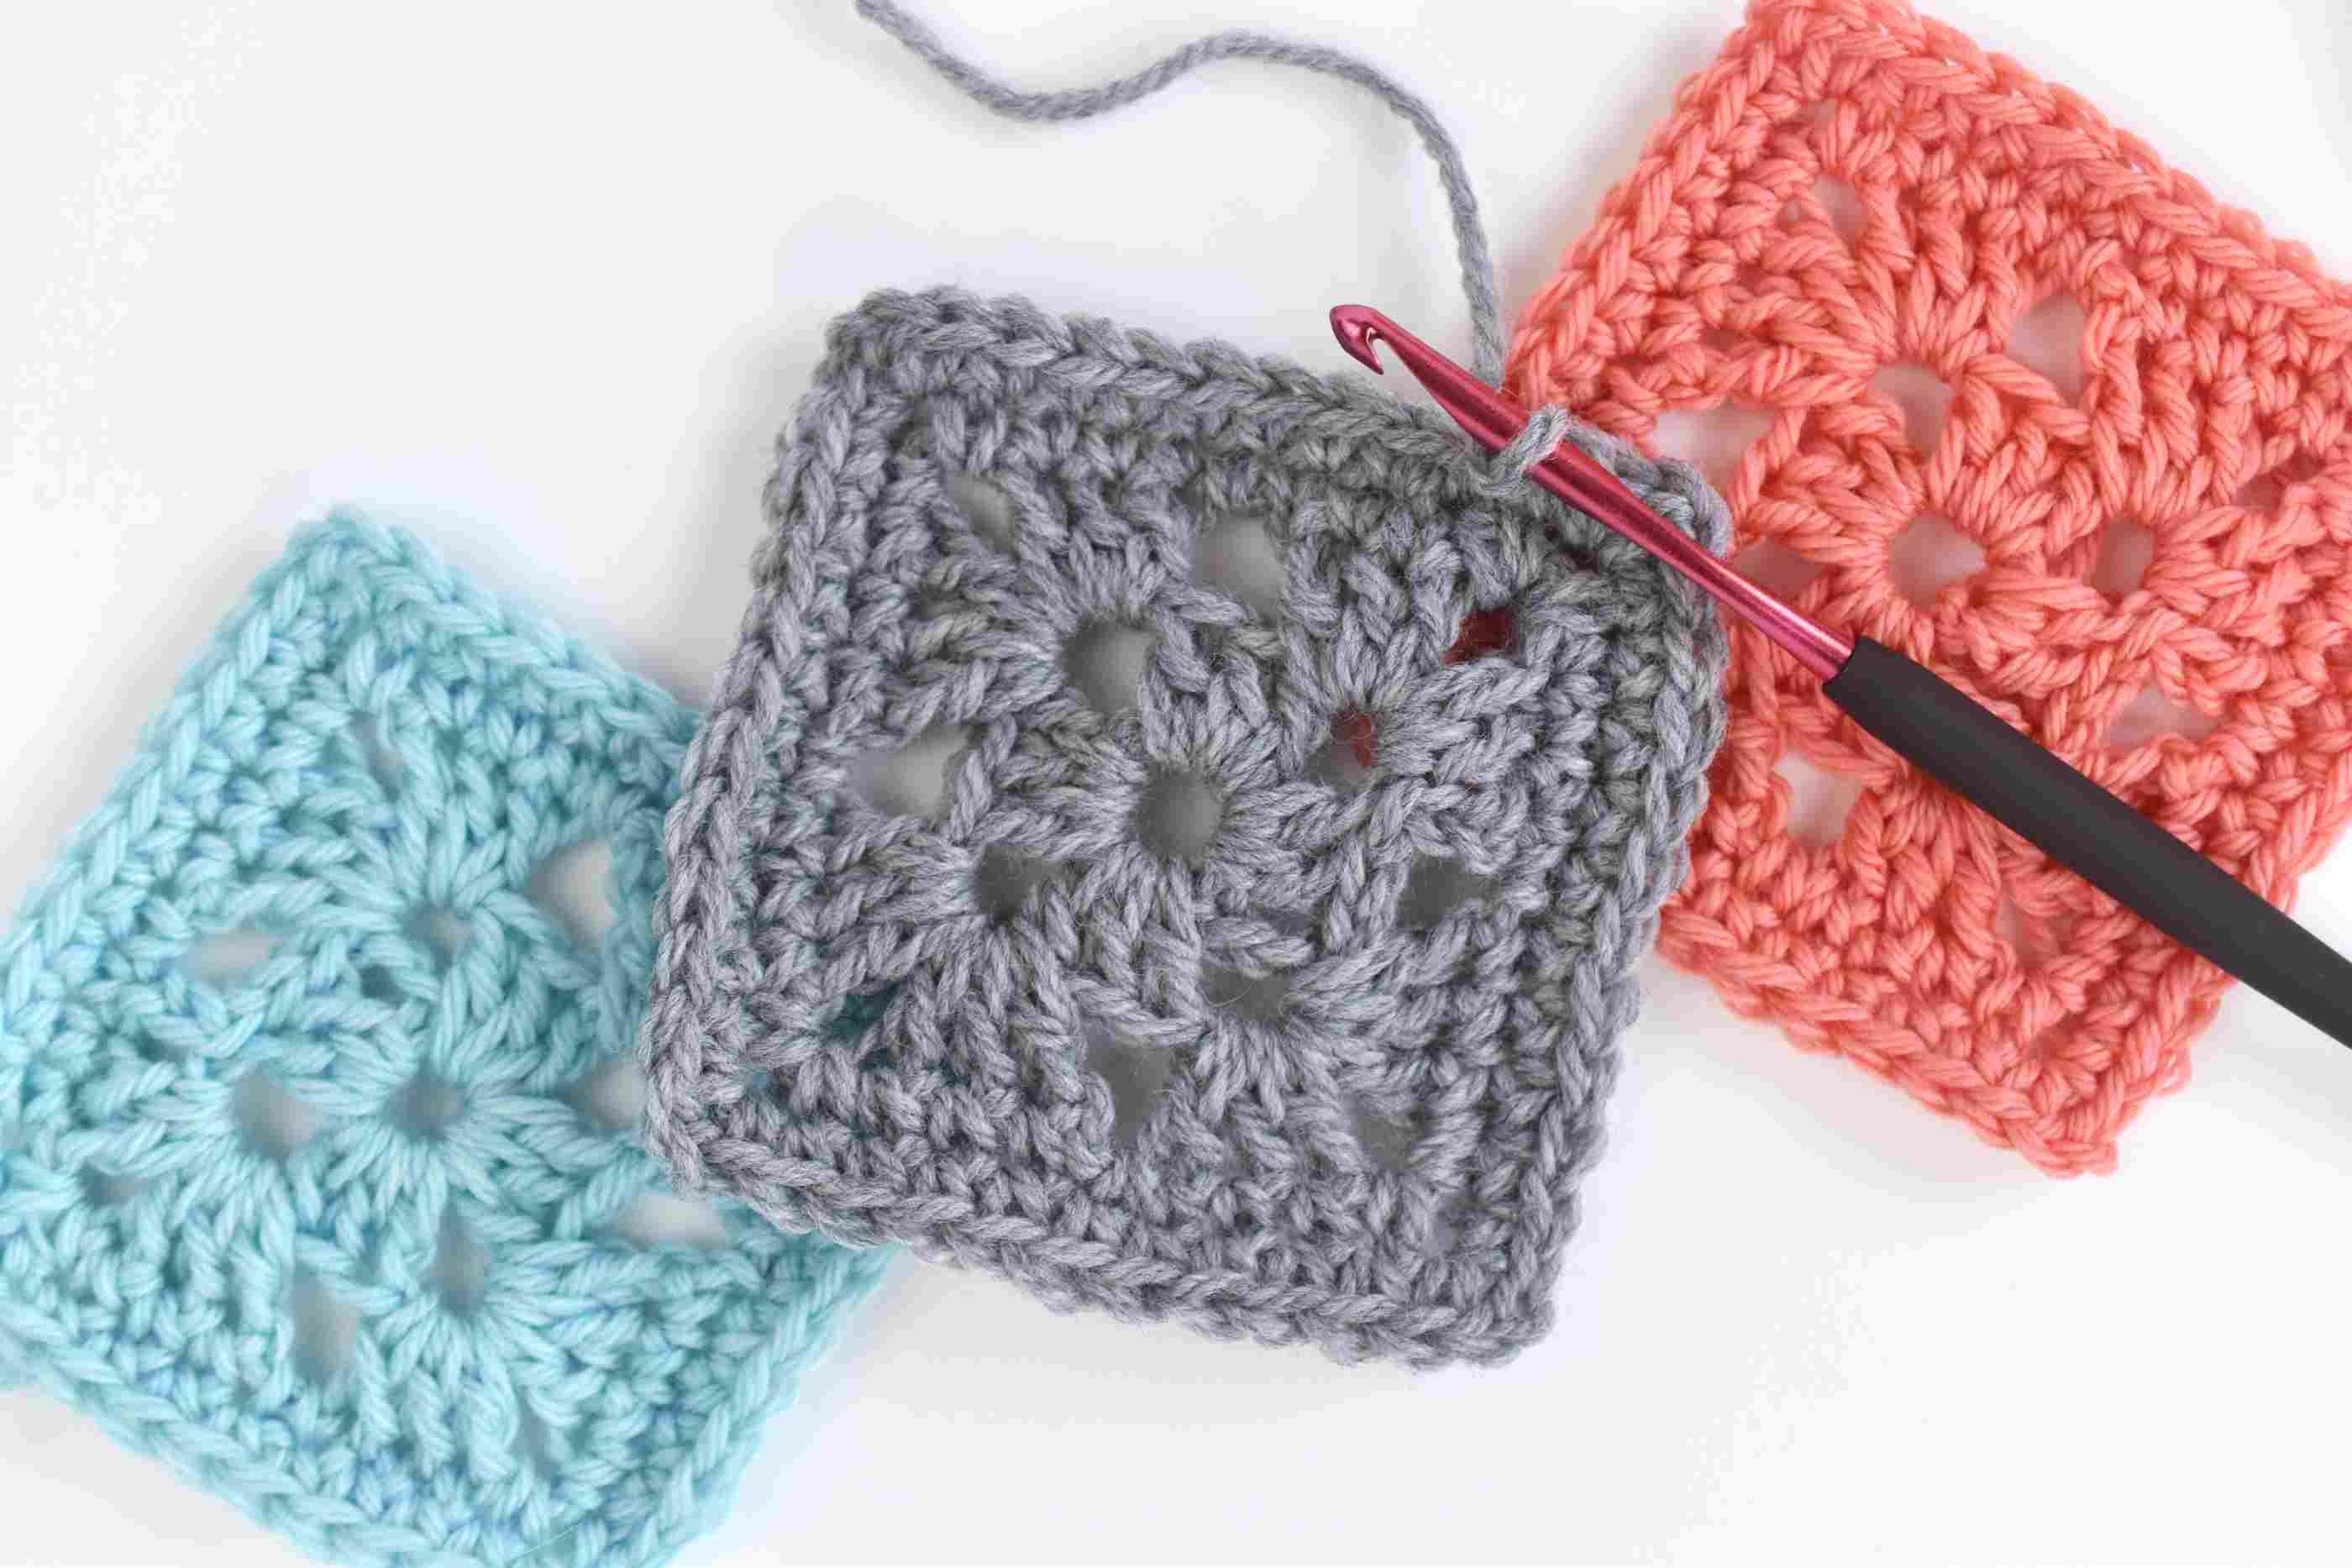 Easy Granny Square Crochet Pattern - Free Printable Crochet Granny Square Patterns